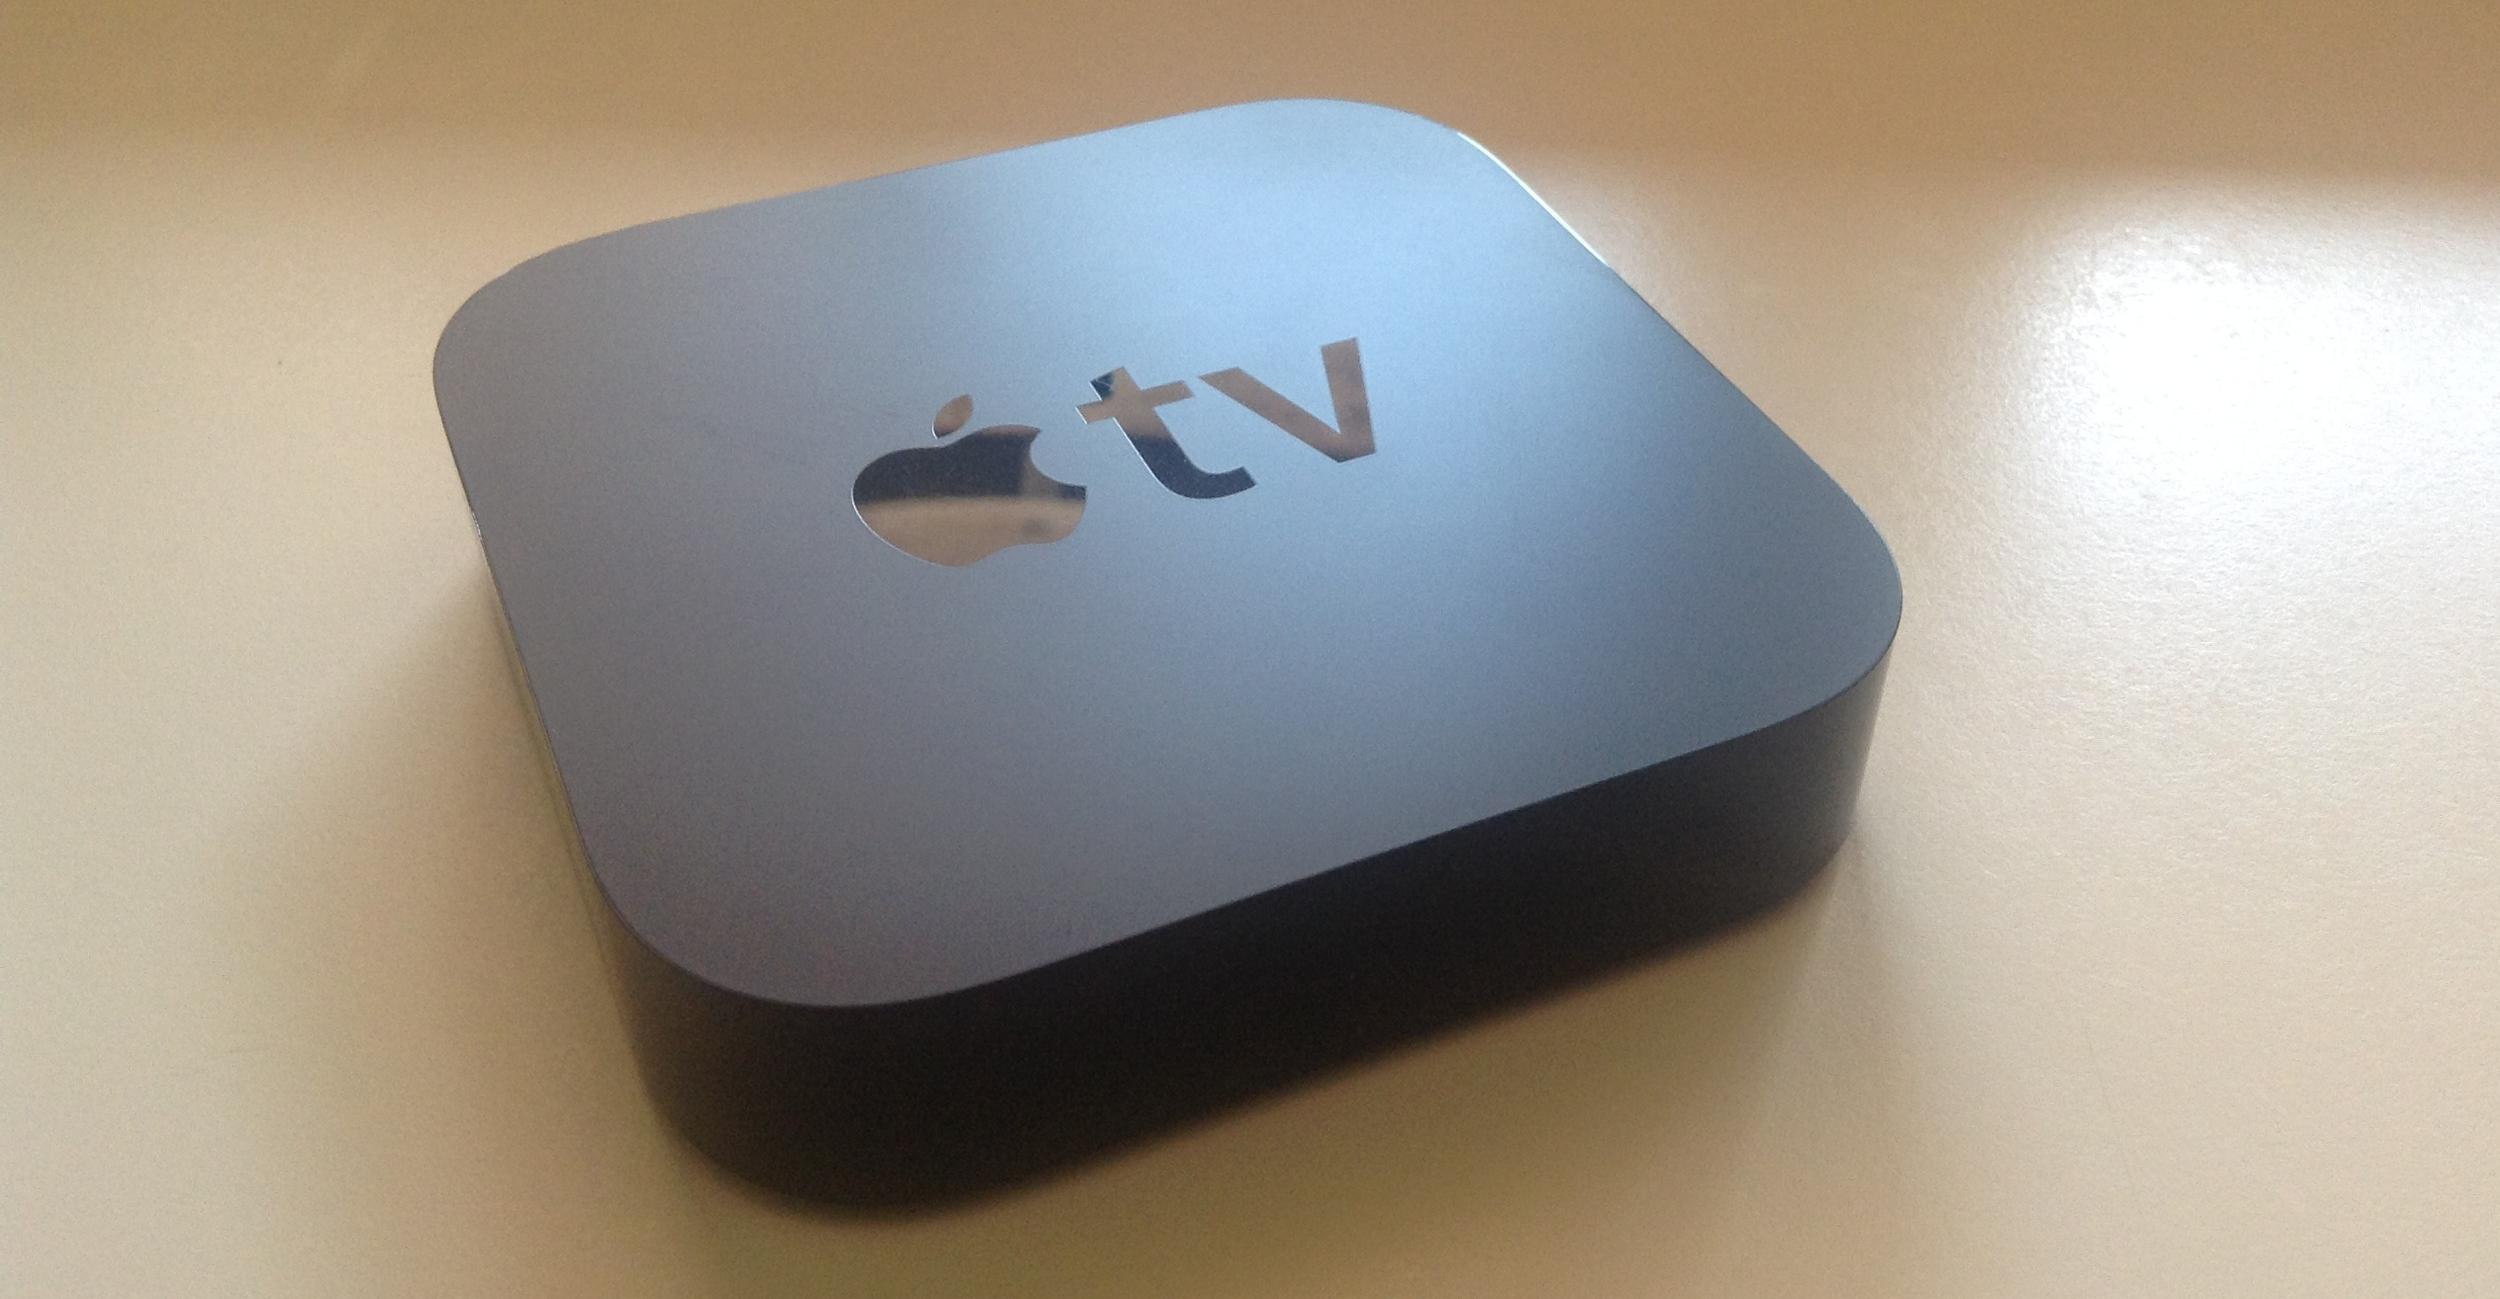 why apple won't make an iTV